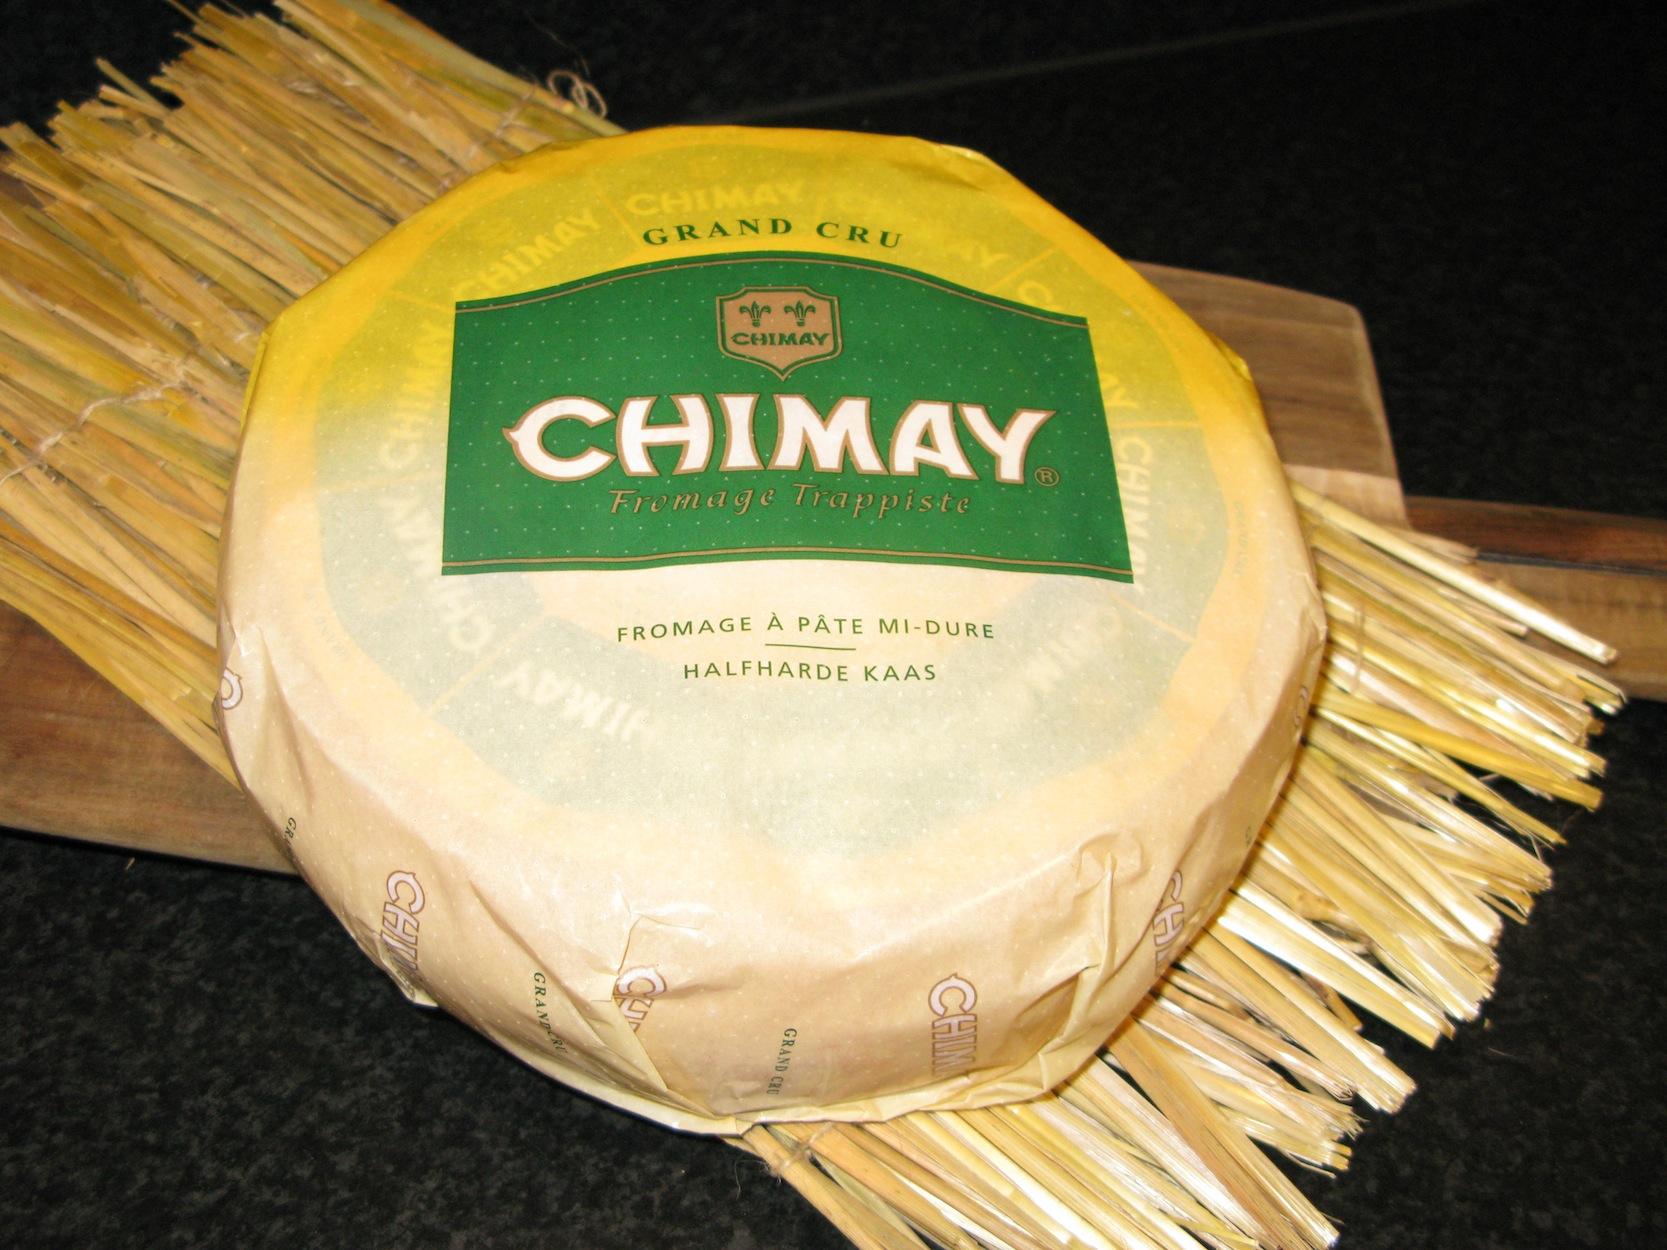 Chimay Cru